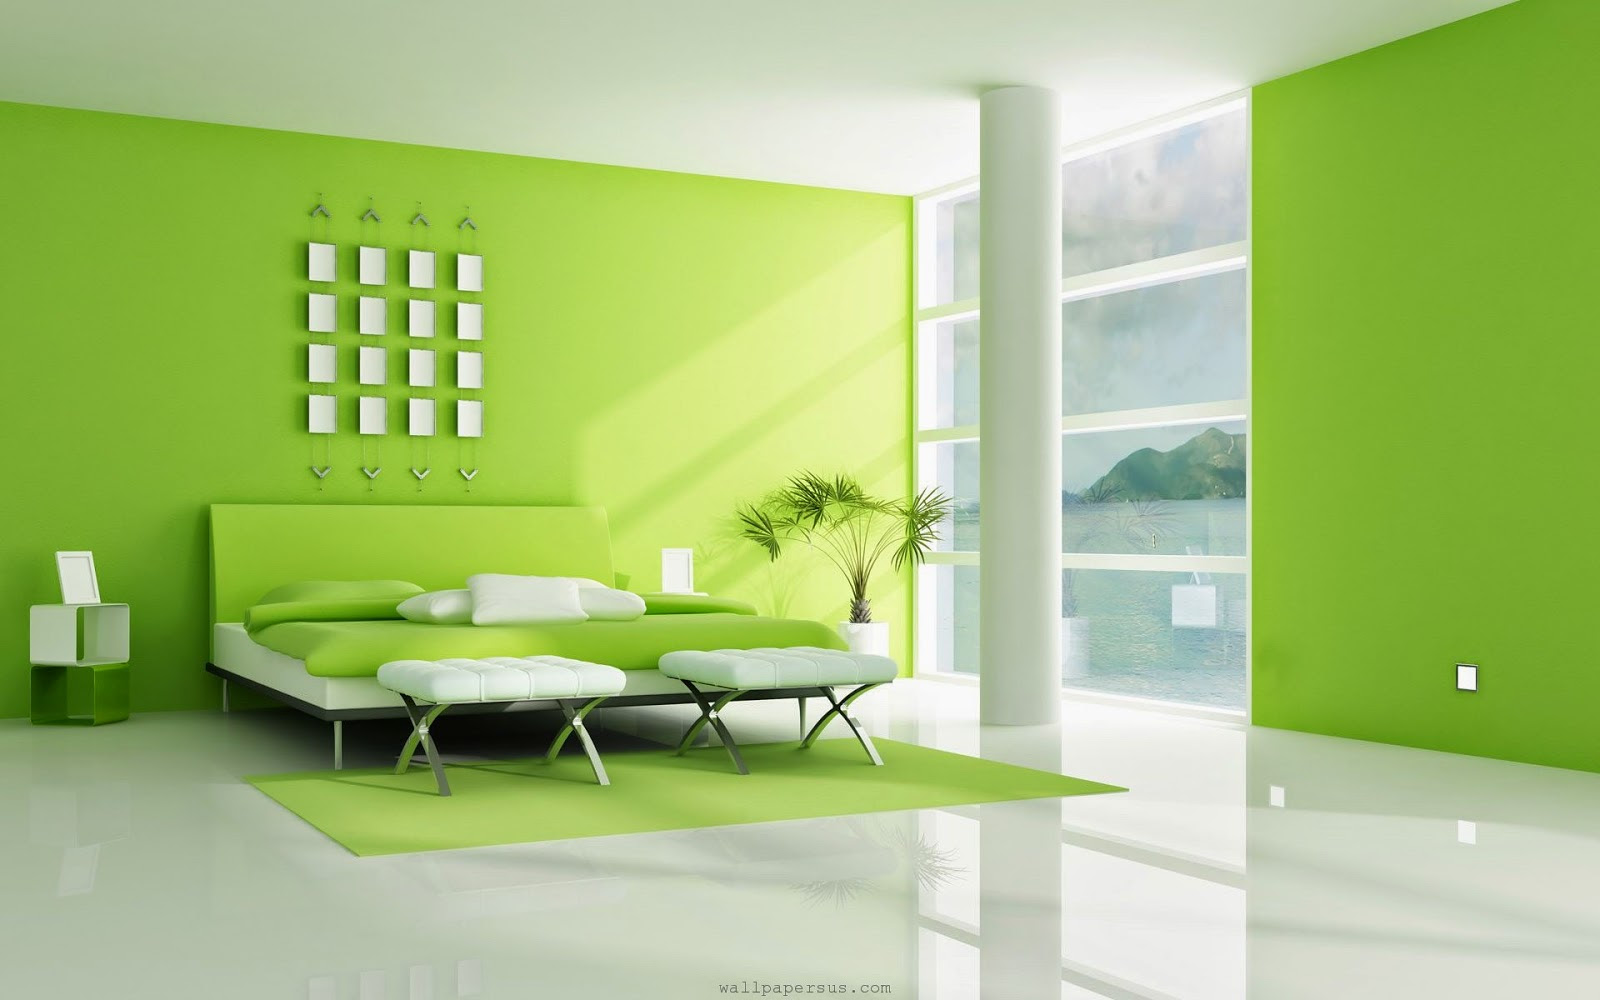 10 Kombinasi Warna Cat Rumah Hijau Untuk Rumah Minimalis Modern Rumah Impian